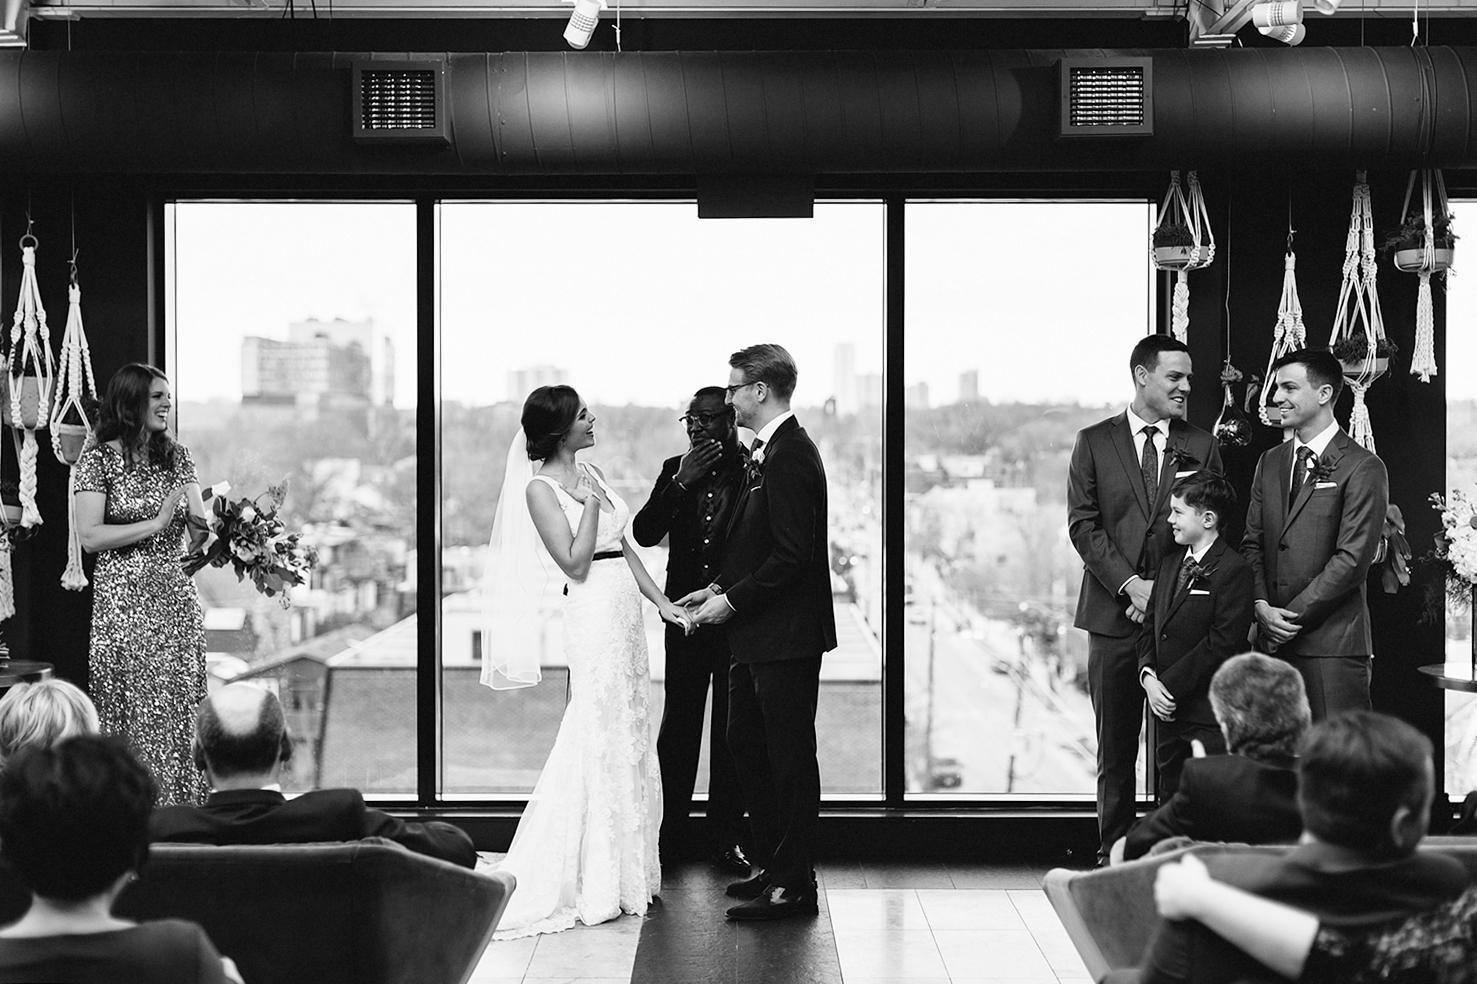 61-broadview-hotel-wedding-photos-best-wedding-venues-toronto-analog-wedding-photography-boutique-hotel-18.jpg